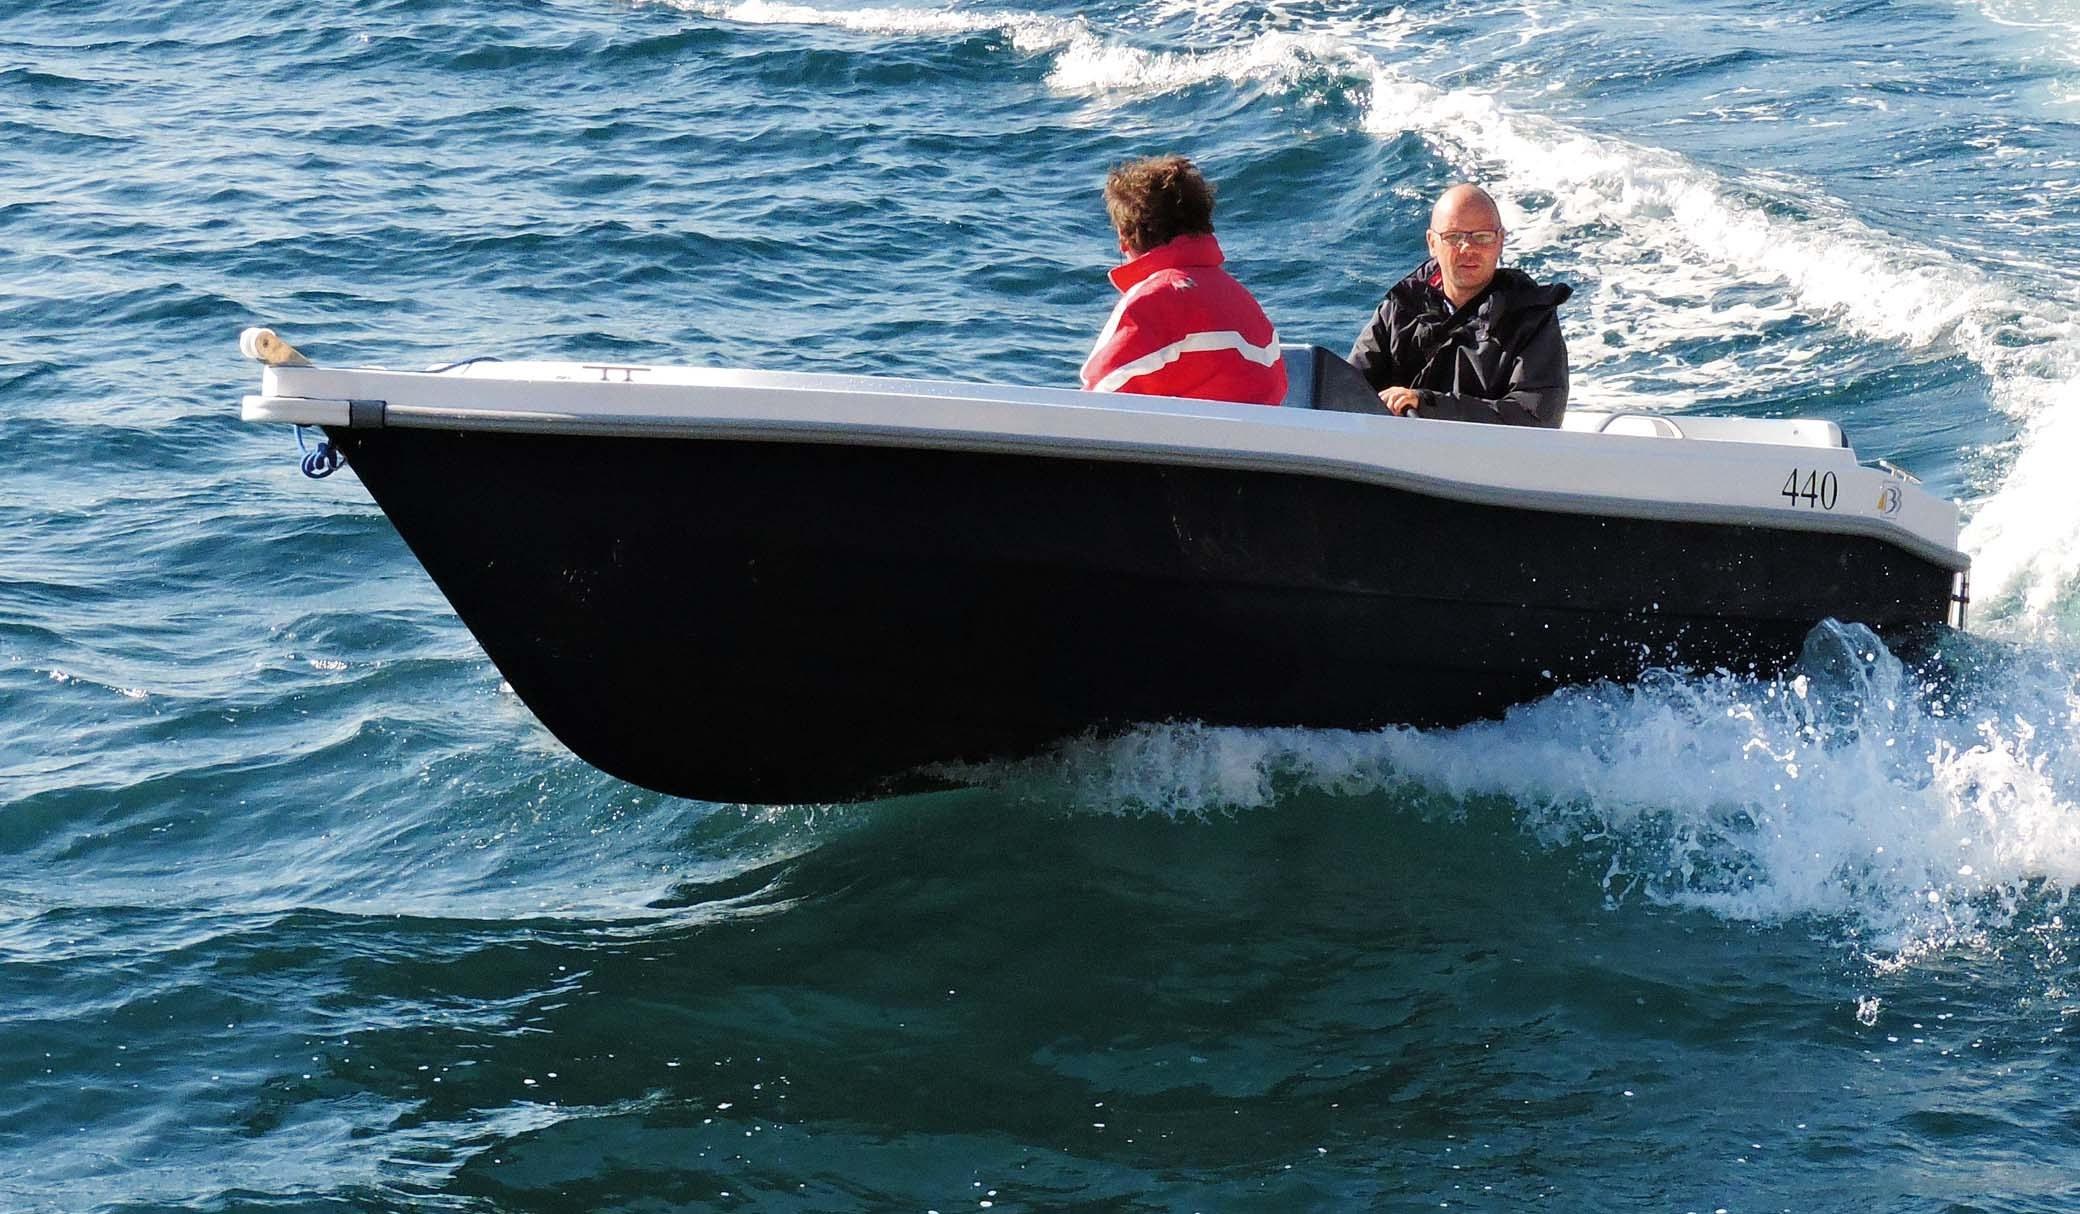 Baltic 440